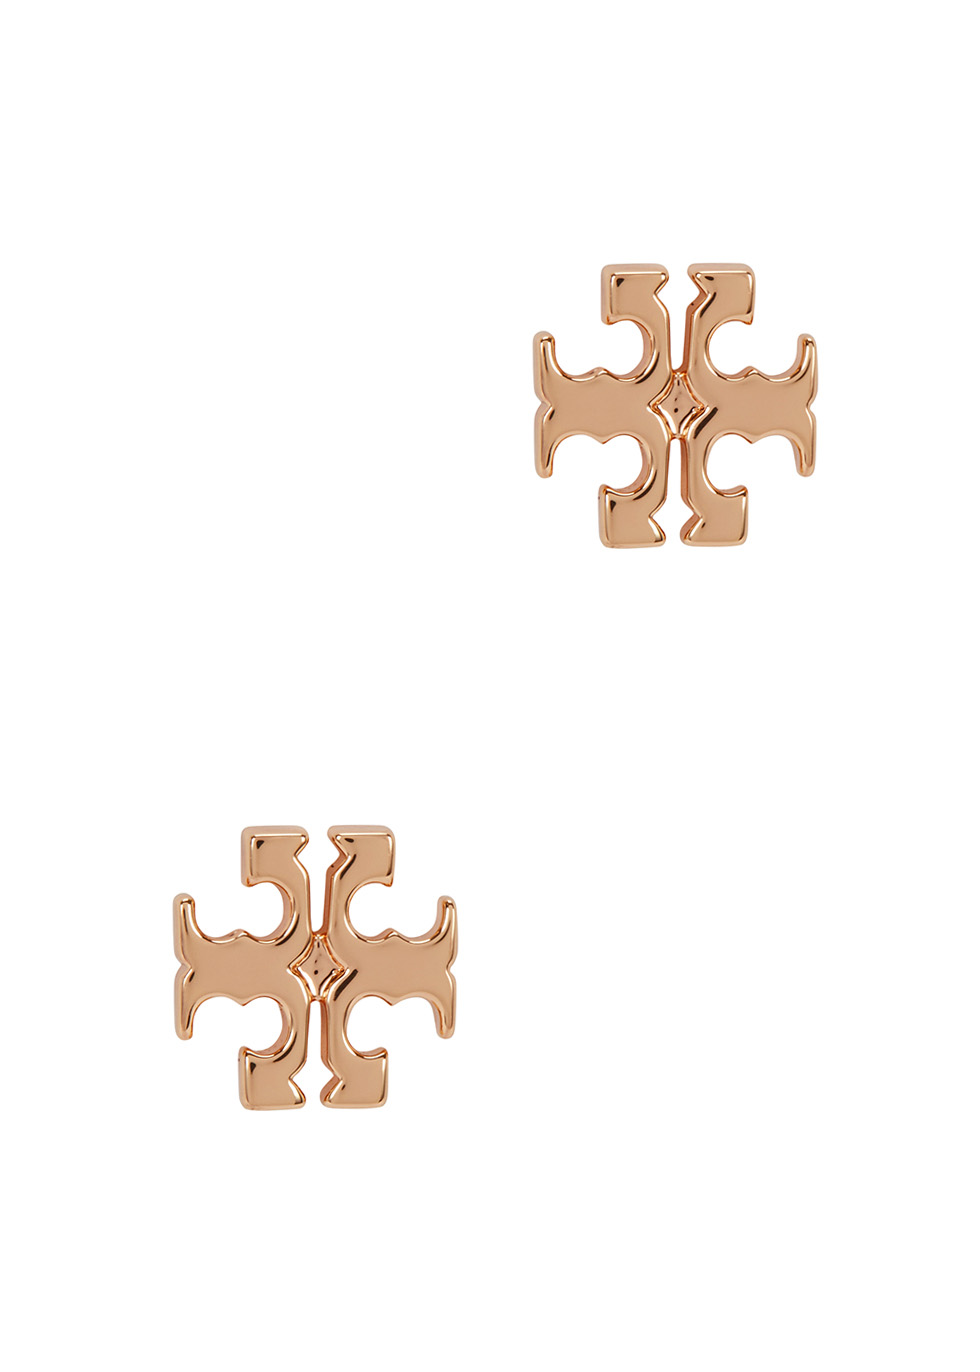 Rose gold-plated logo stud earrings - Tory Burch